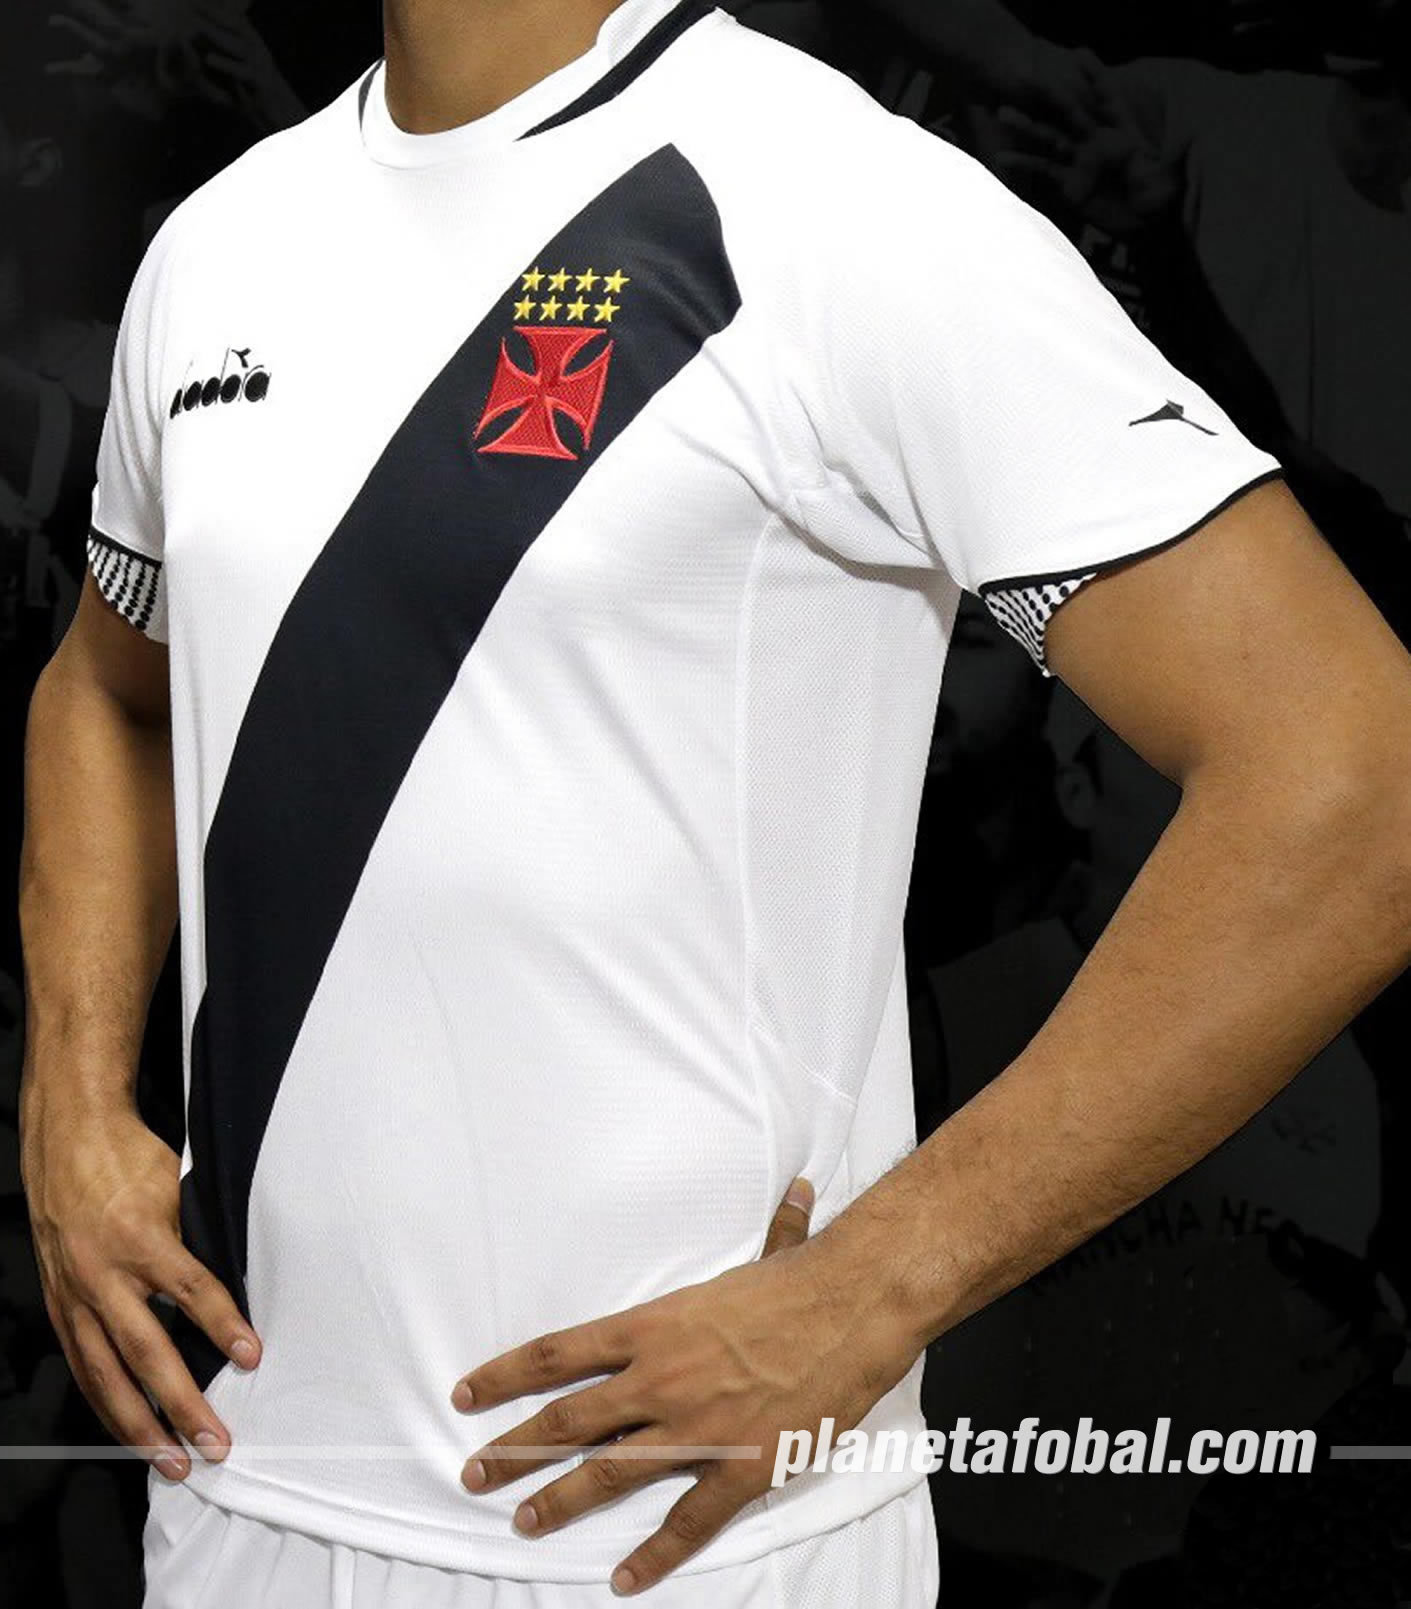 Camisetas Diadora del Vasco Da Gama 2018 711cc20f00a7d